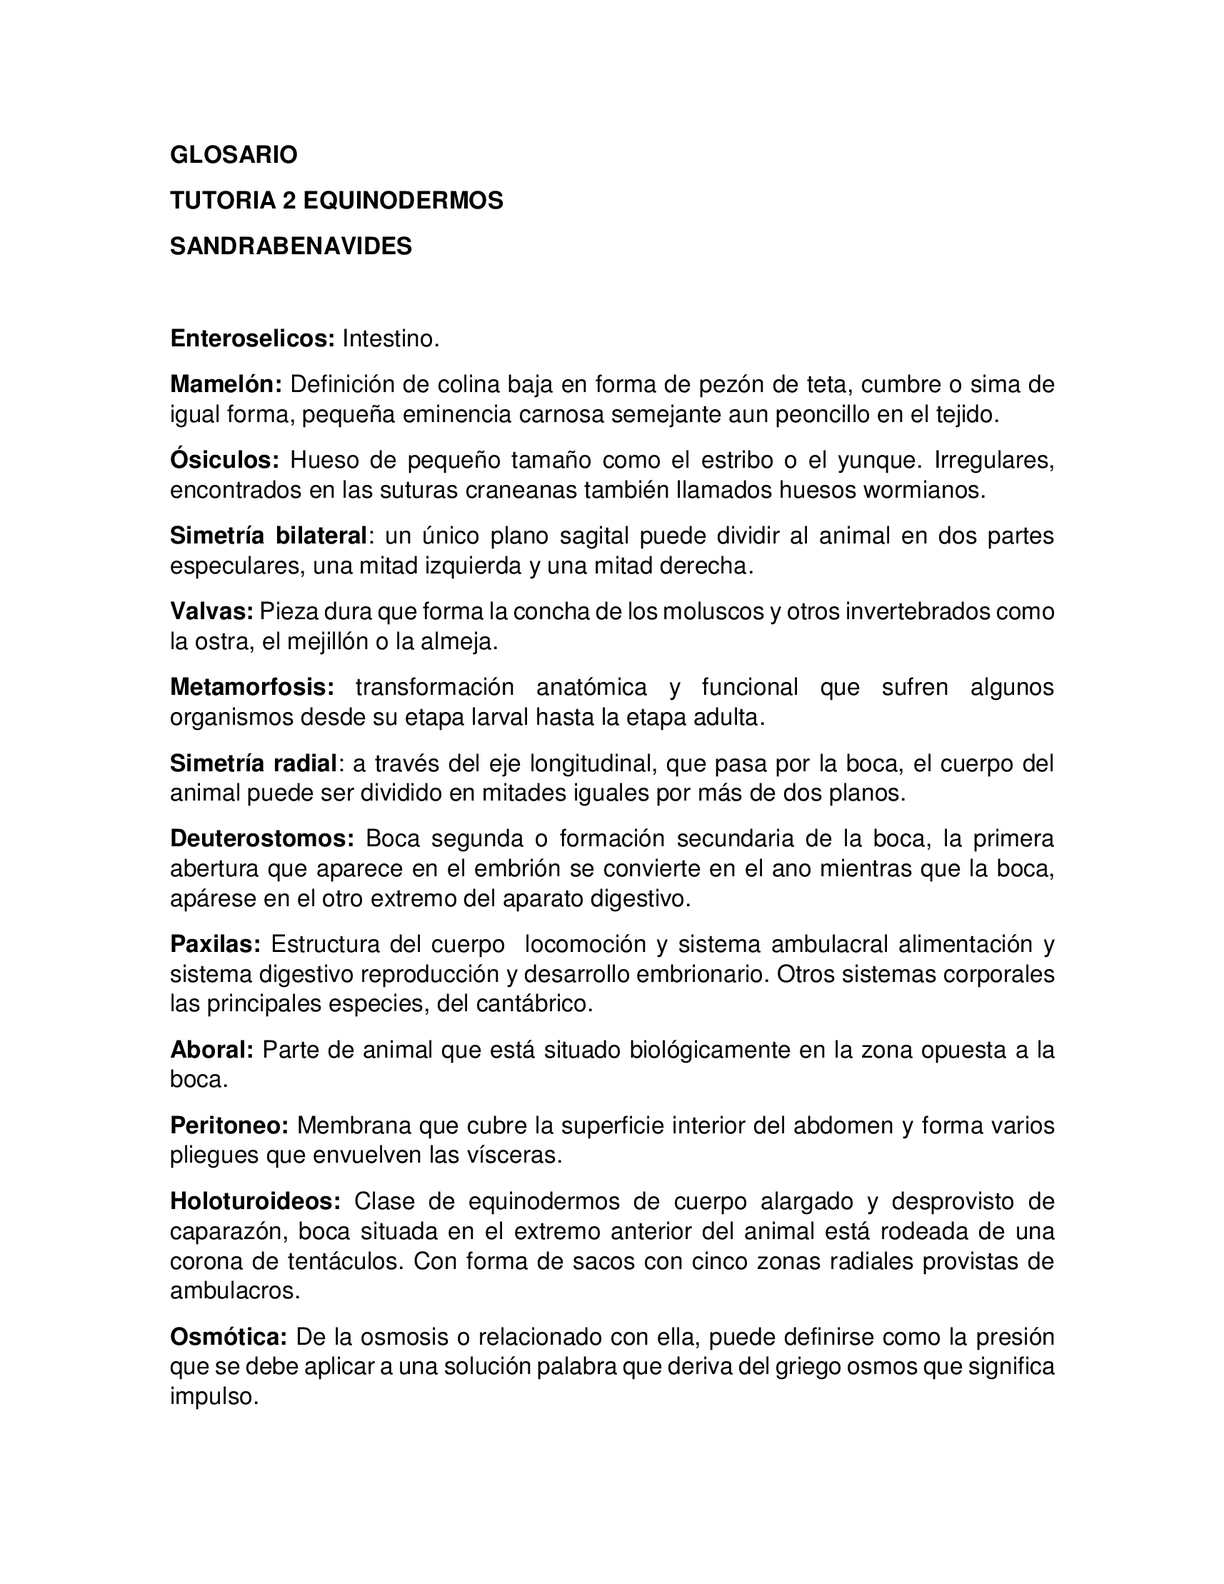 Calaméo - Glosario Equinodermos